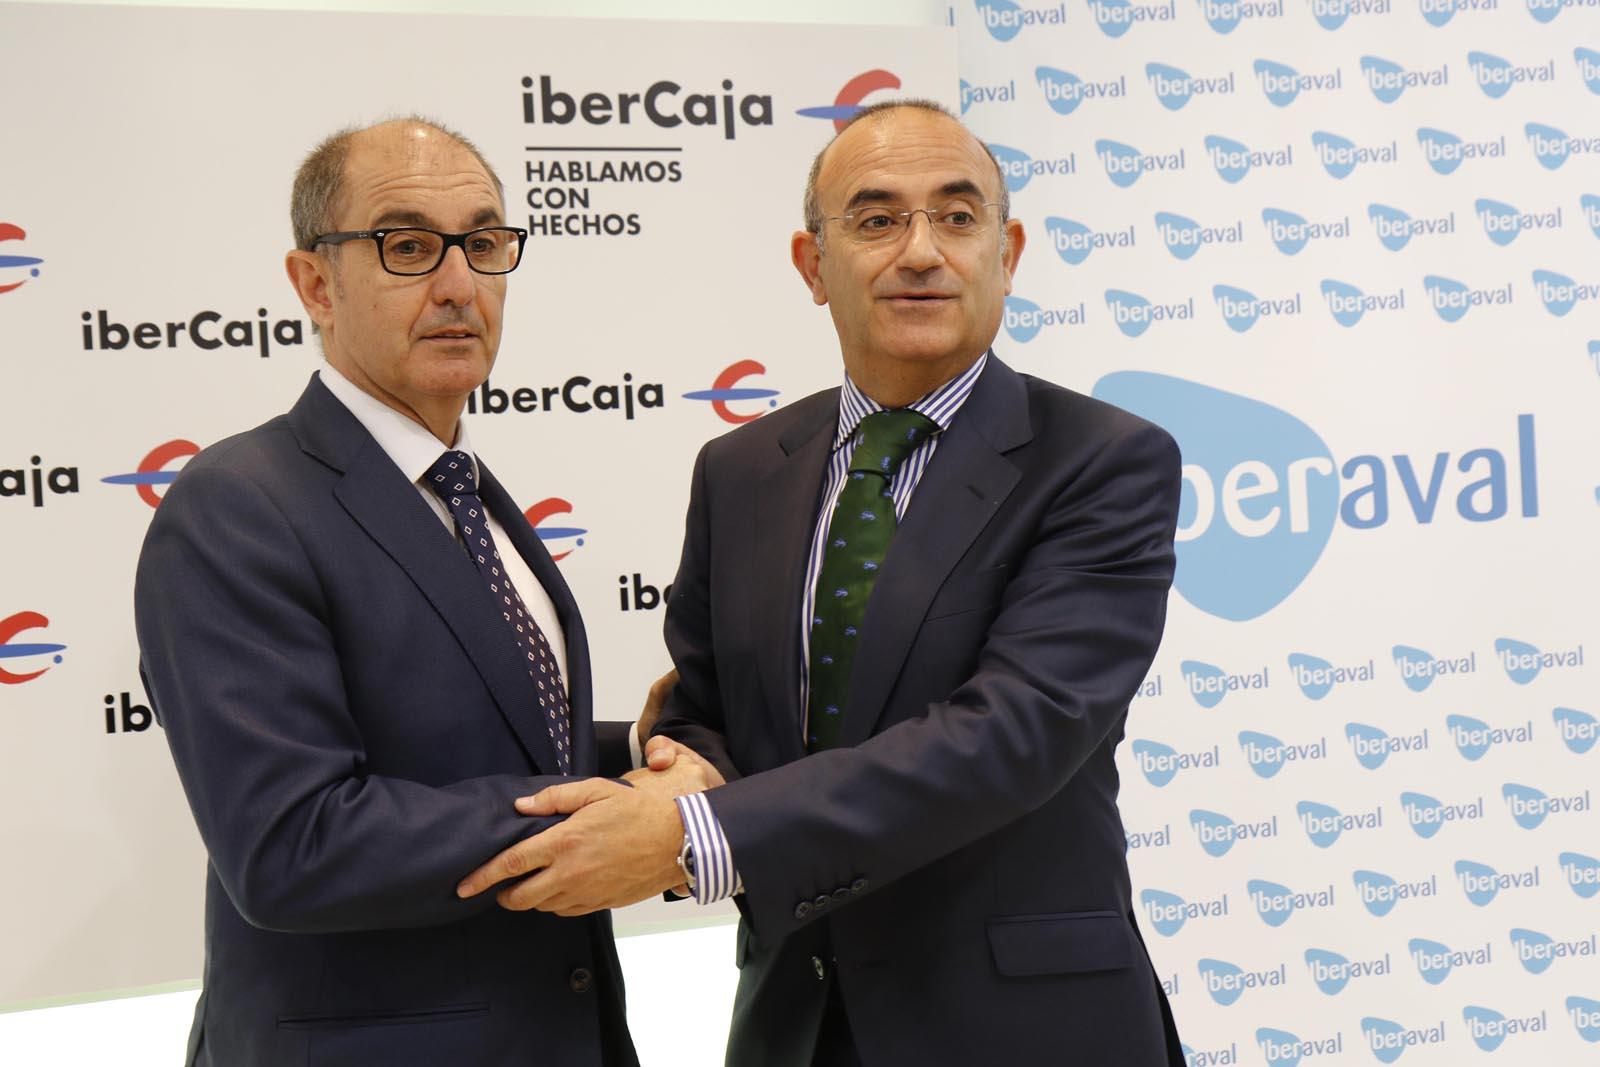 Acuerdo Iberaval-Ibercaja